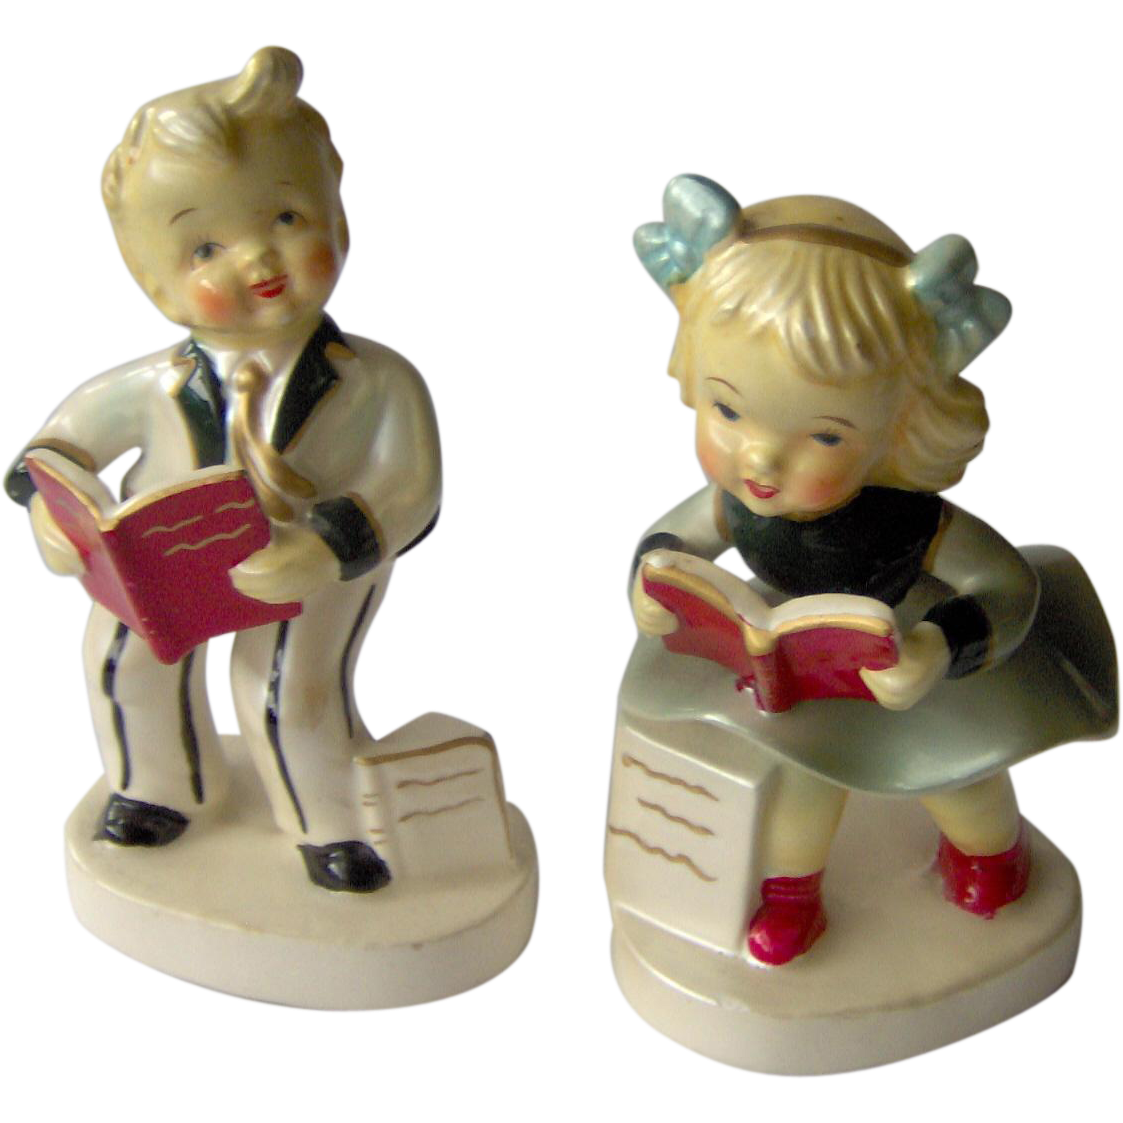 Vintage Children Reading Books Figurines